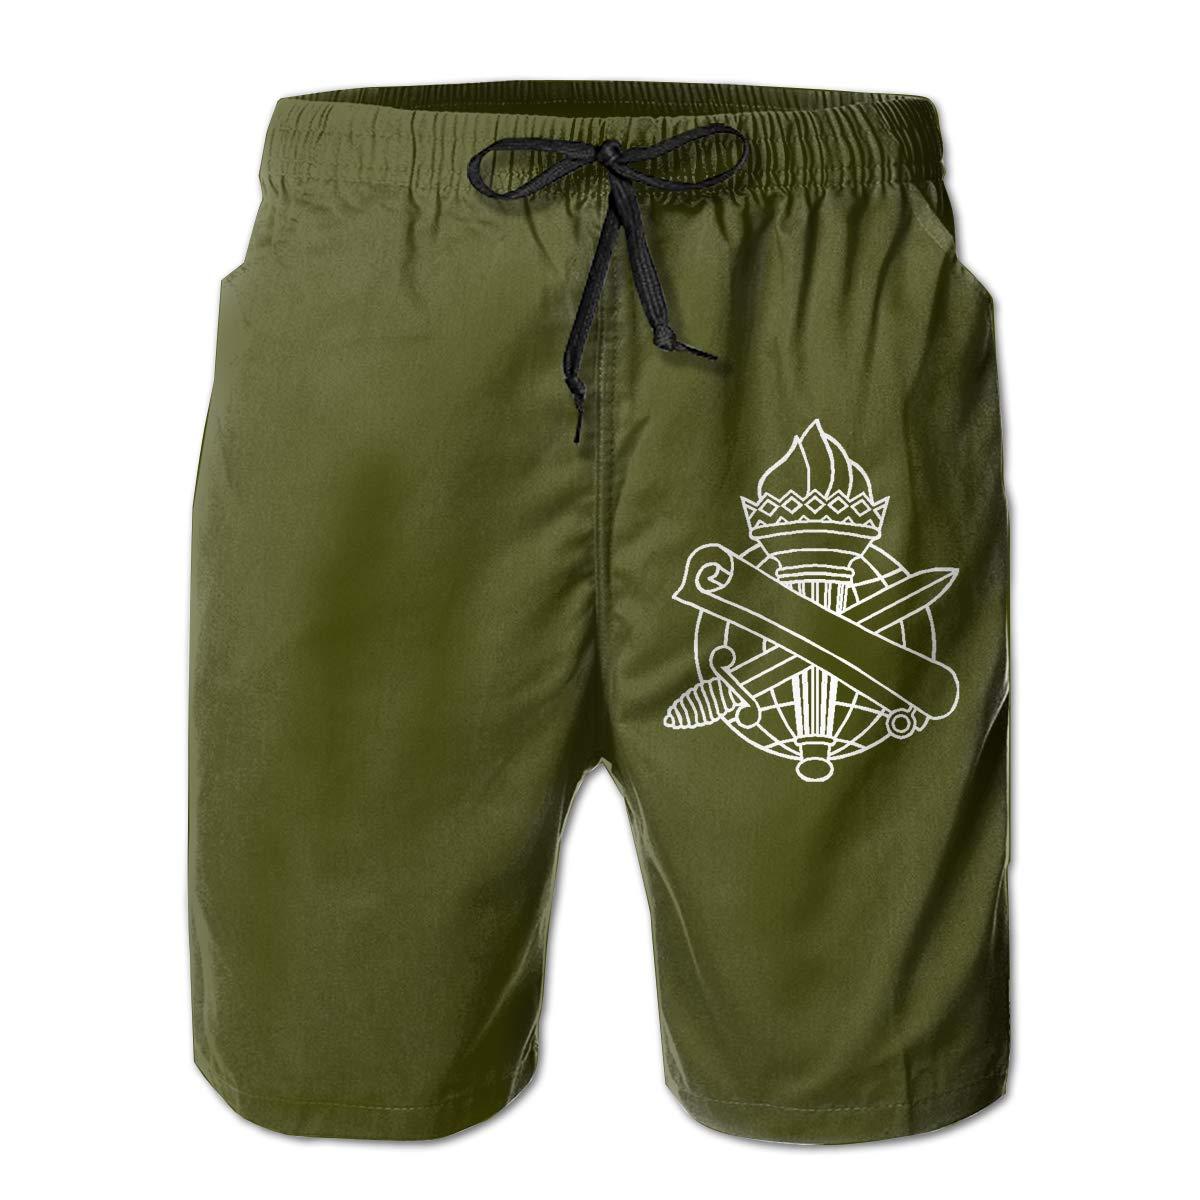 USA Civil Affairs Corps Mens Board Shorts Swim Trunks Beachwear Hiker Trunks